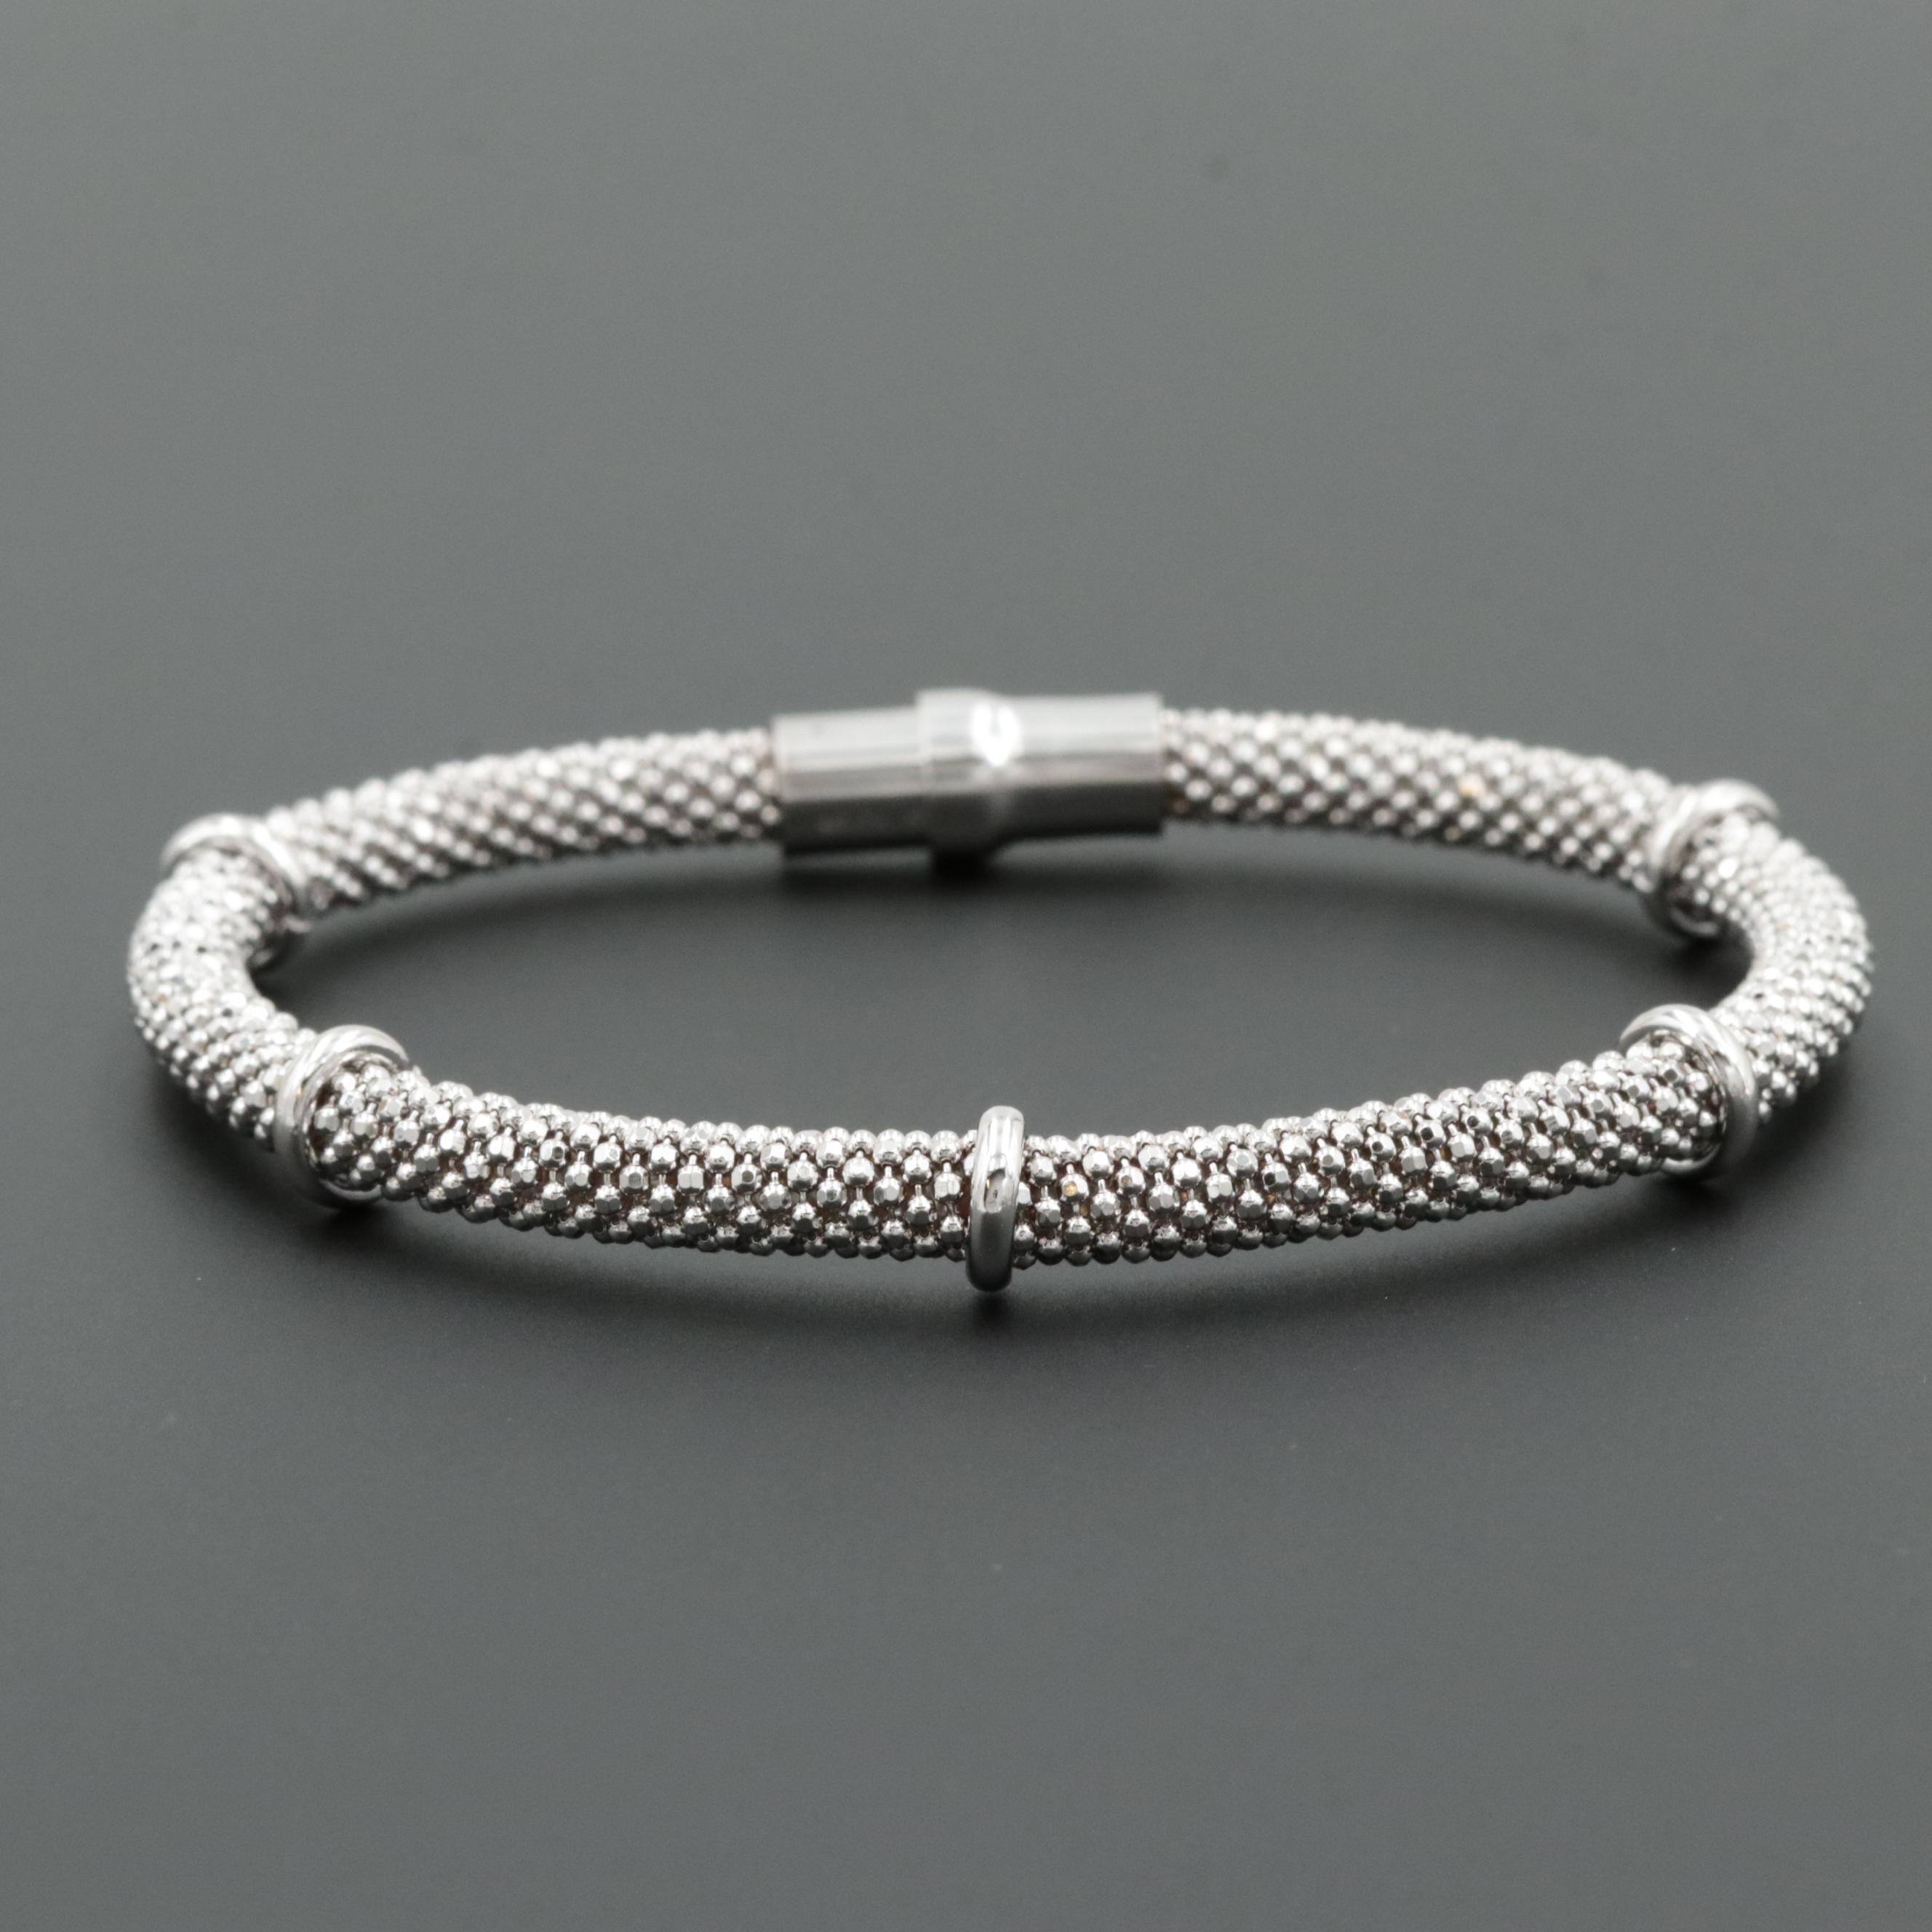 Rosa Leal Sterling Silver Flexible Bangle Bracelet